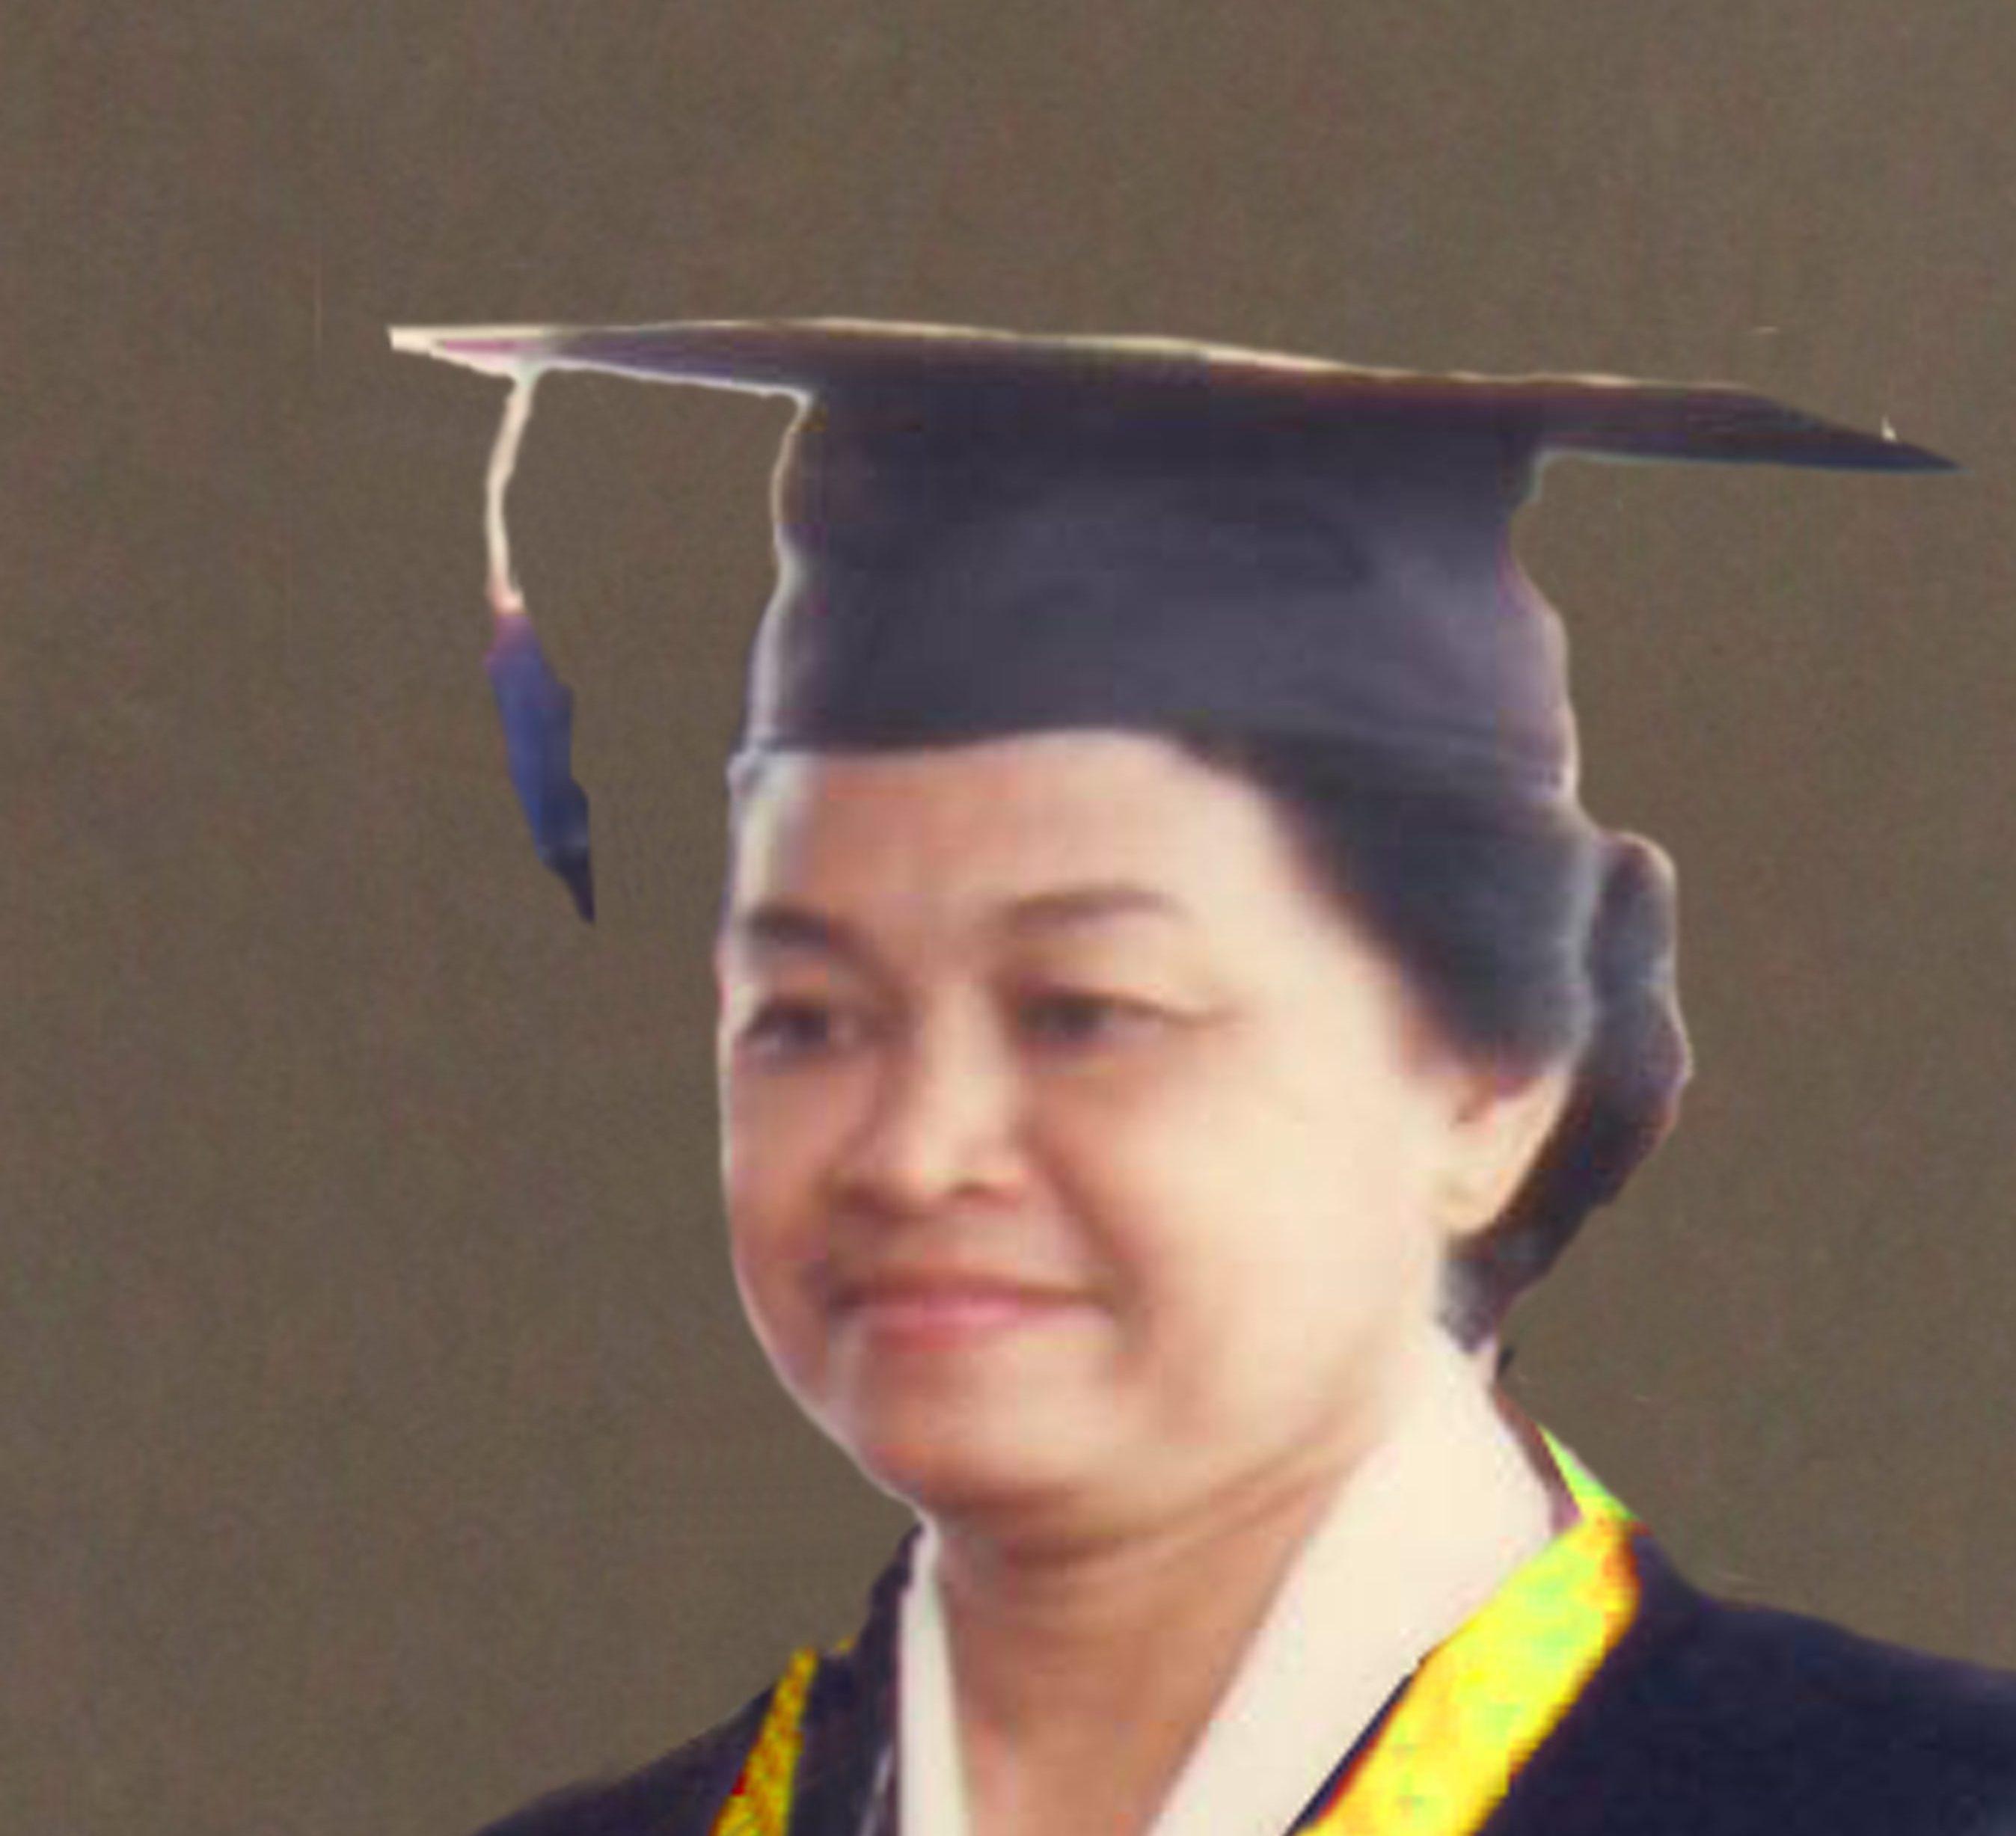 Radiyastuti mendapat gelar Ir. dari Fakultas Pertanian Institut Pertanian Bogor tahun 1961